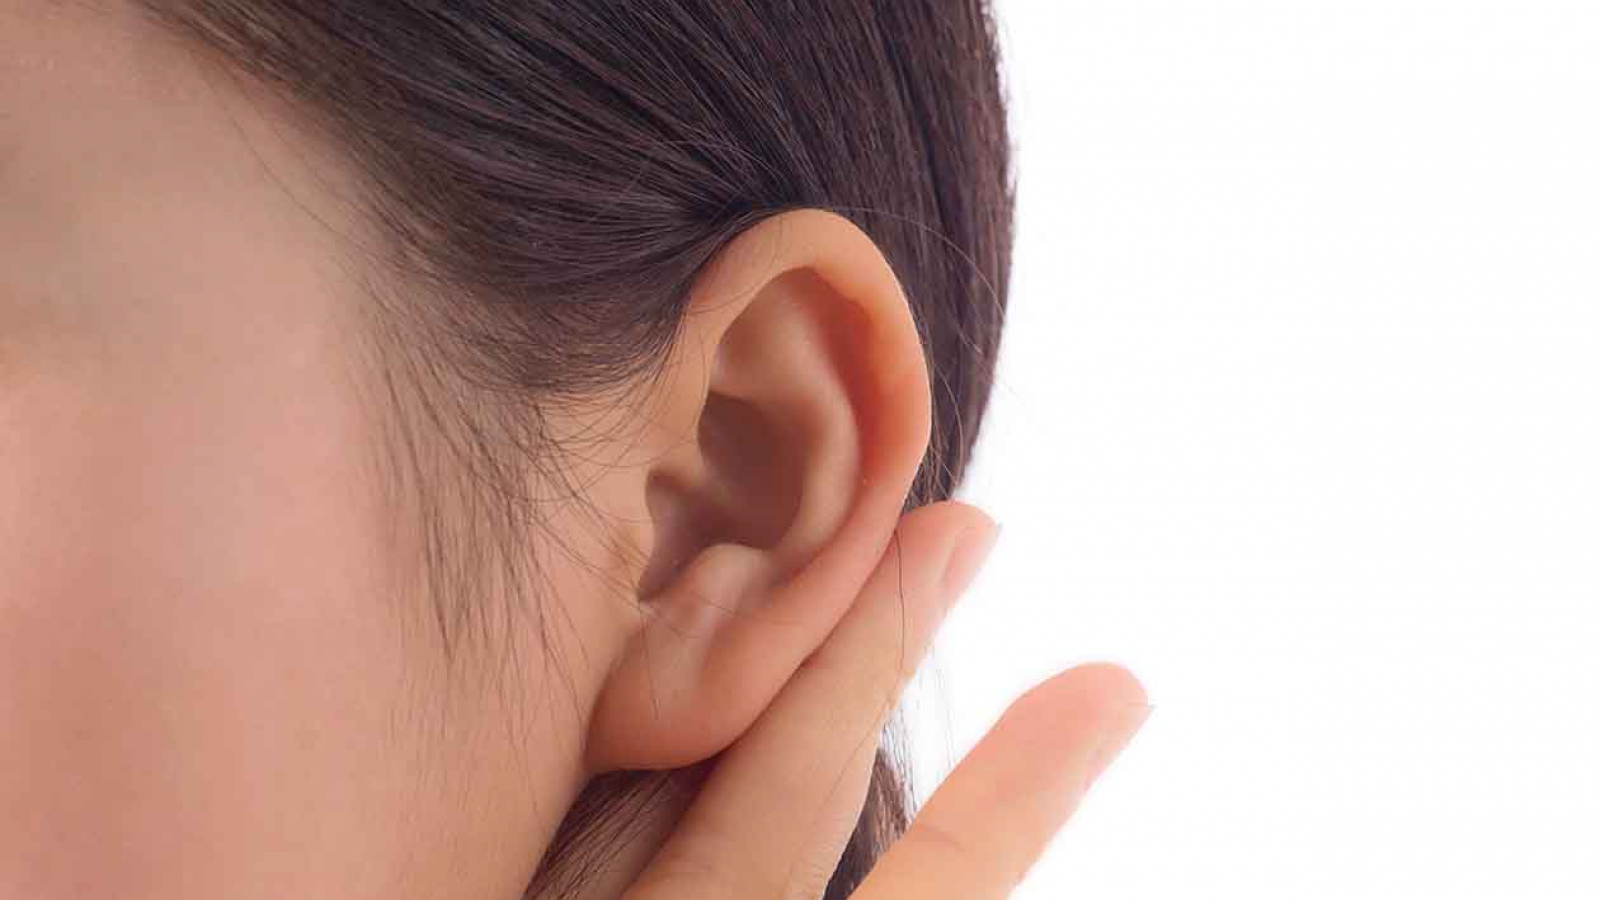 telinga luar